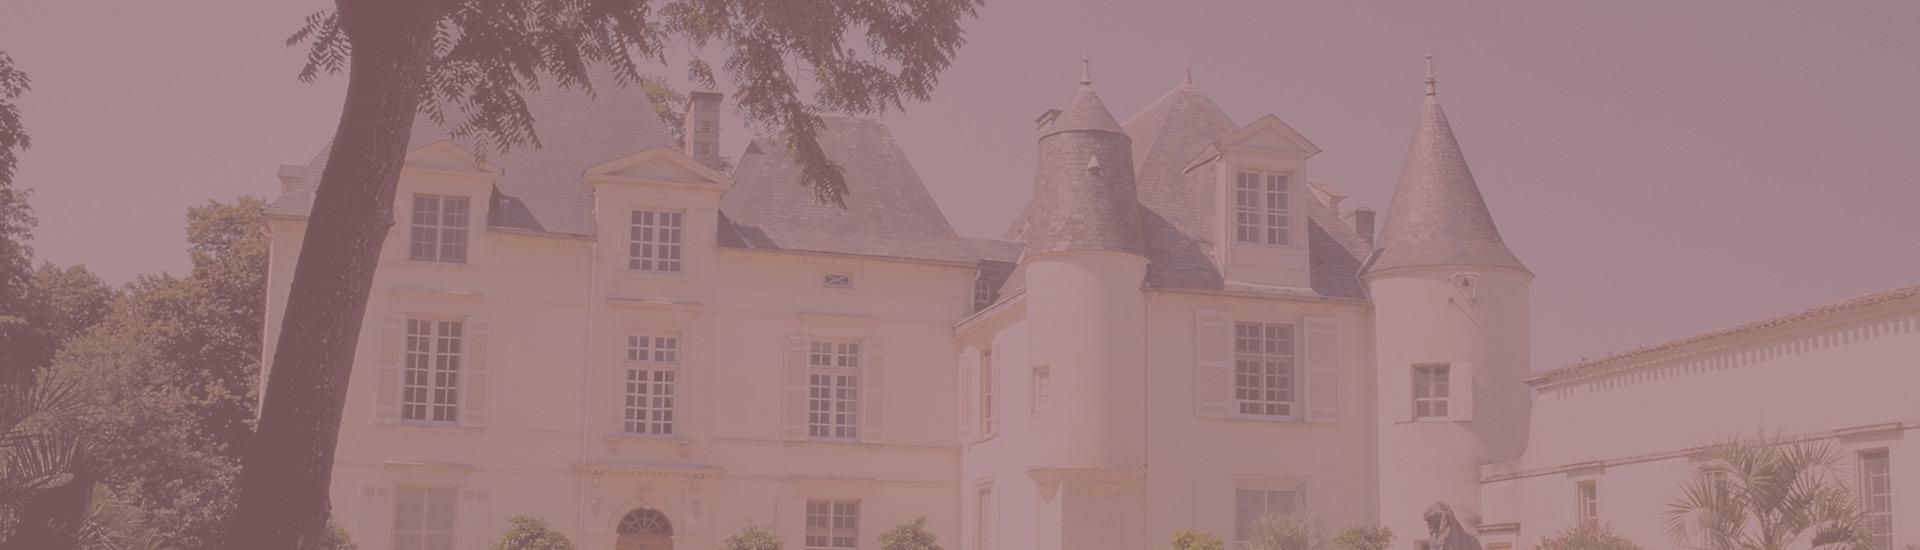 Weine - Bordeaux-Subskription 2020 06-08/2021 - Slider